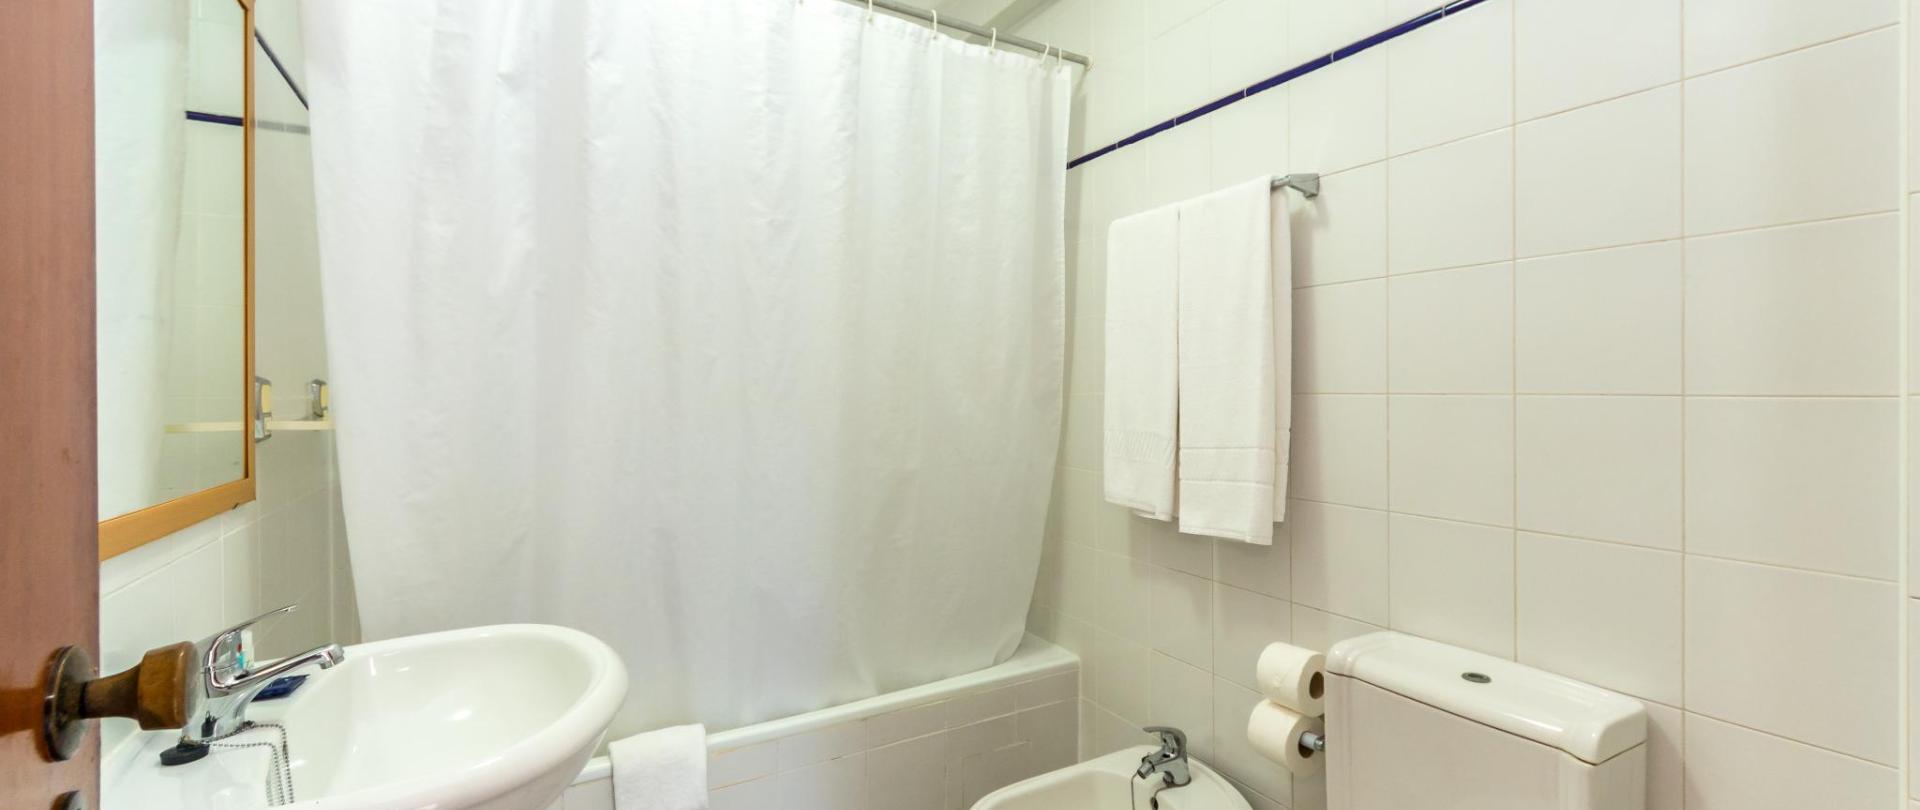 Ouratlantico - Apartamento T0 C-4.jpg